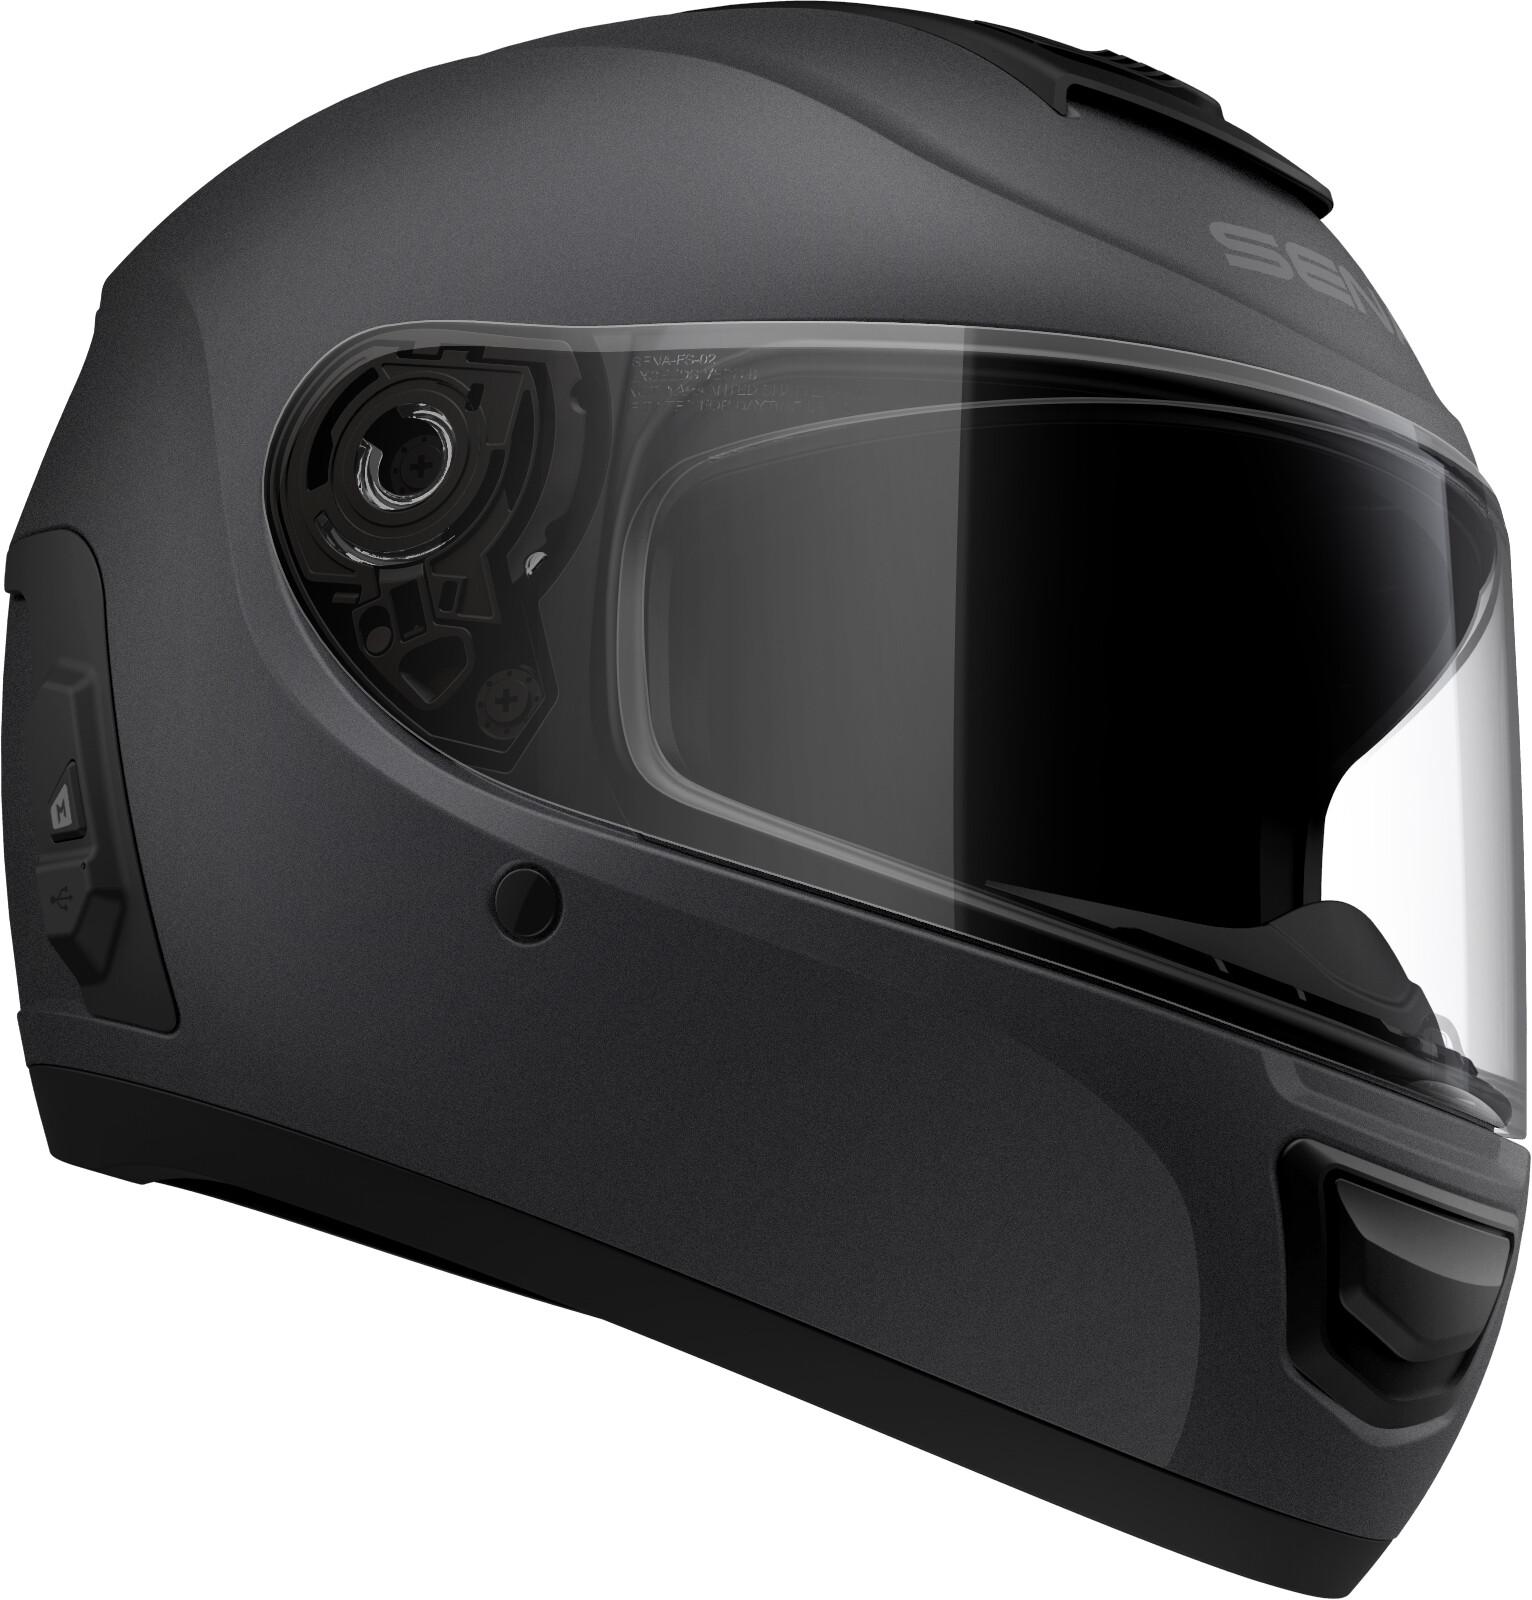 Momentum Evo Helmet w/Mesh Intercom